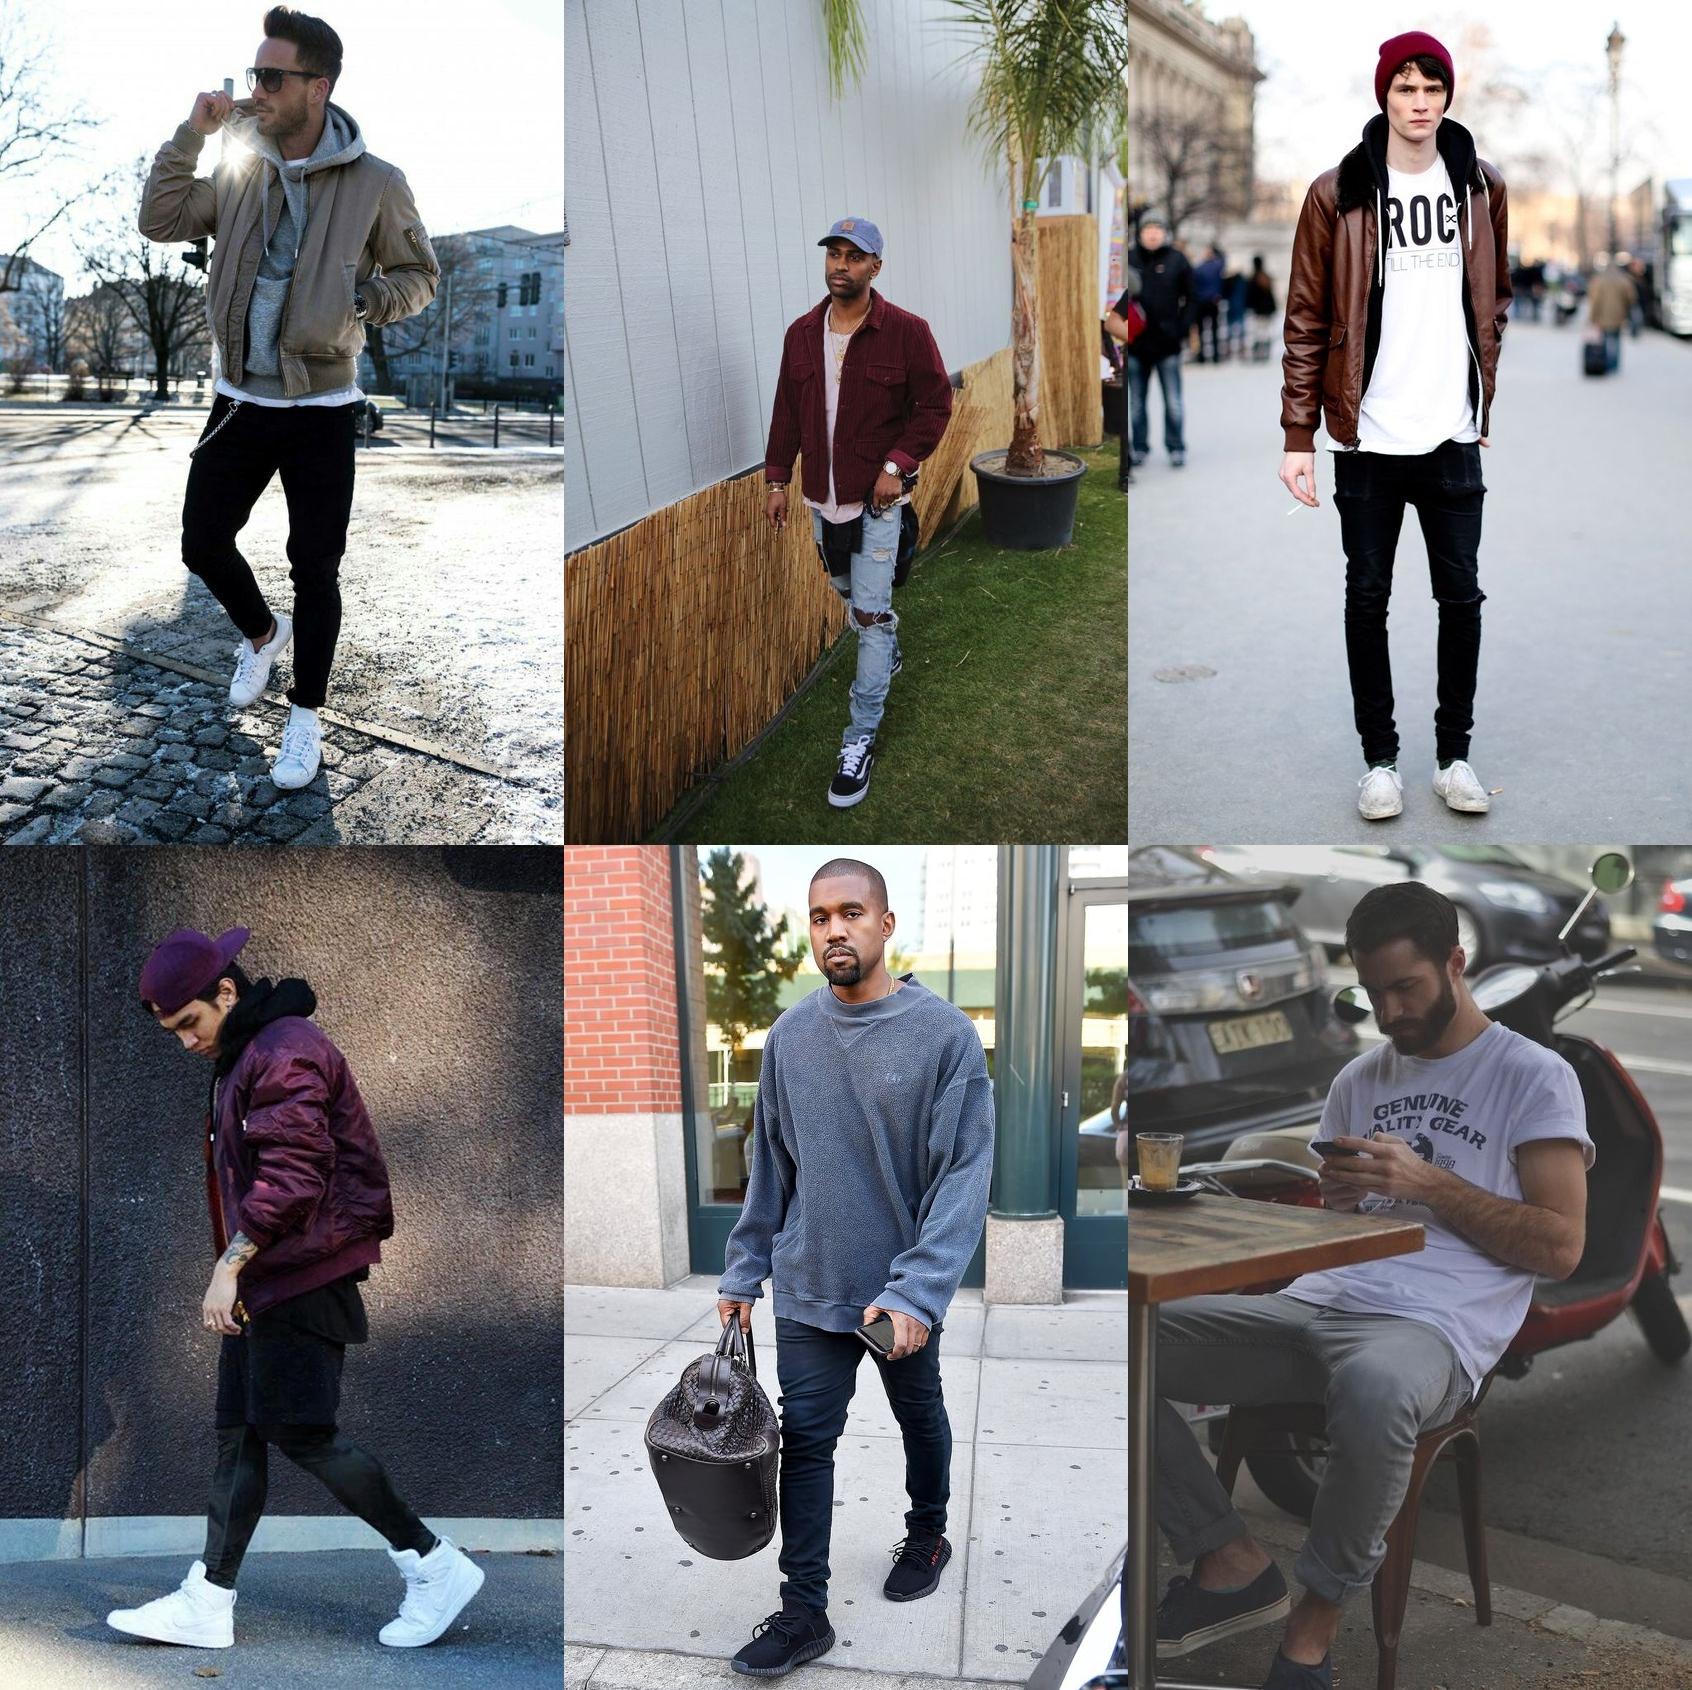 tendencia de moda masculina 2017, tendencia masculina inverno 2017, look masculino 2017, roupa masculina, estilo masculino, blog de moda masculina, moda sem censura, alex cursino, 4